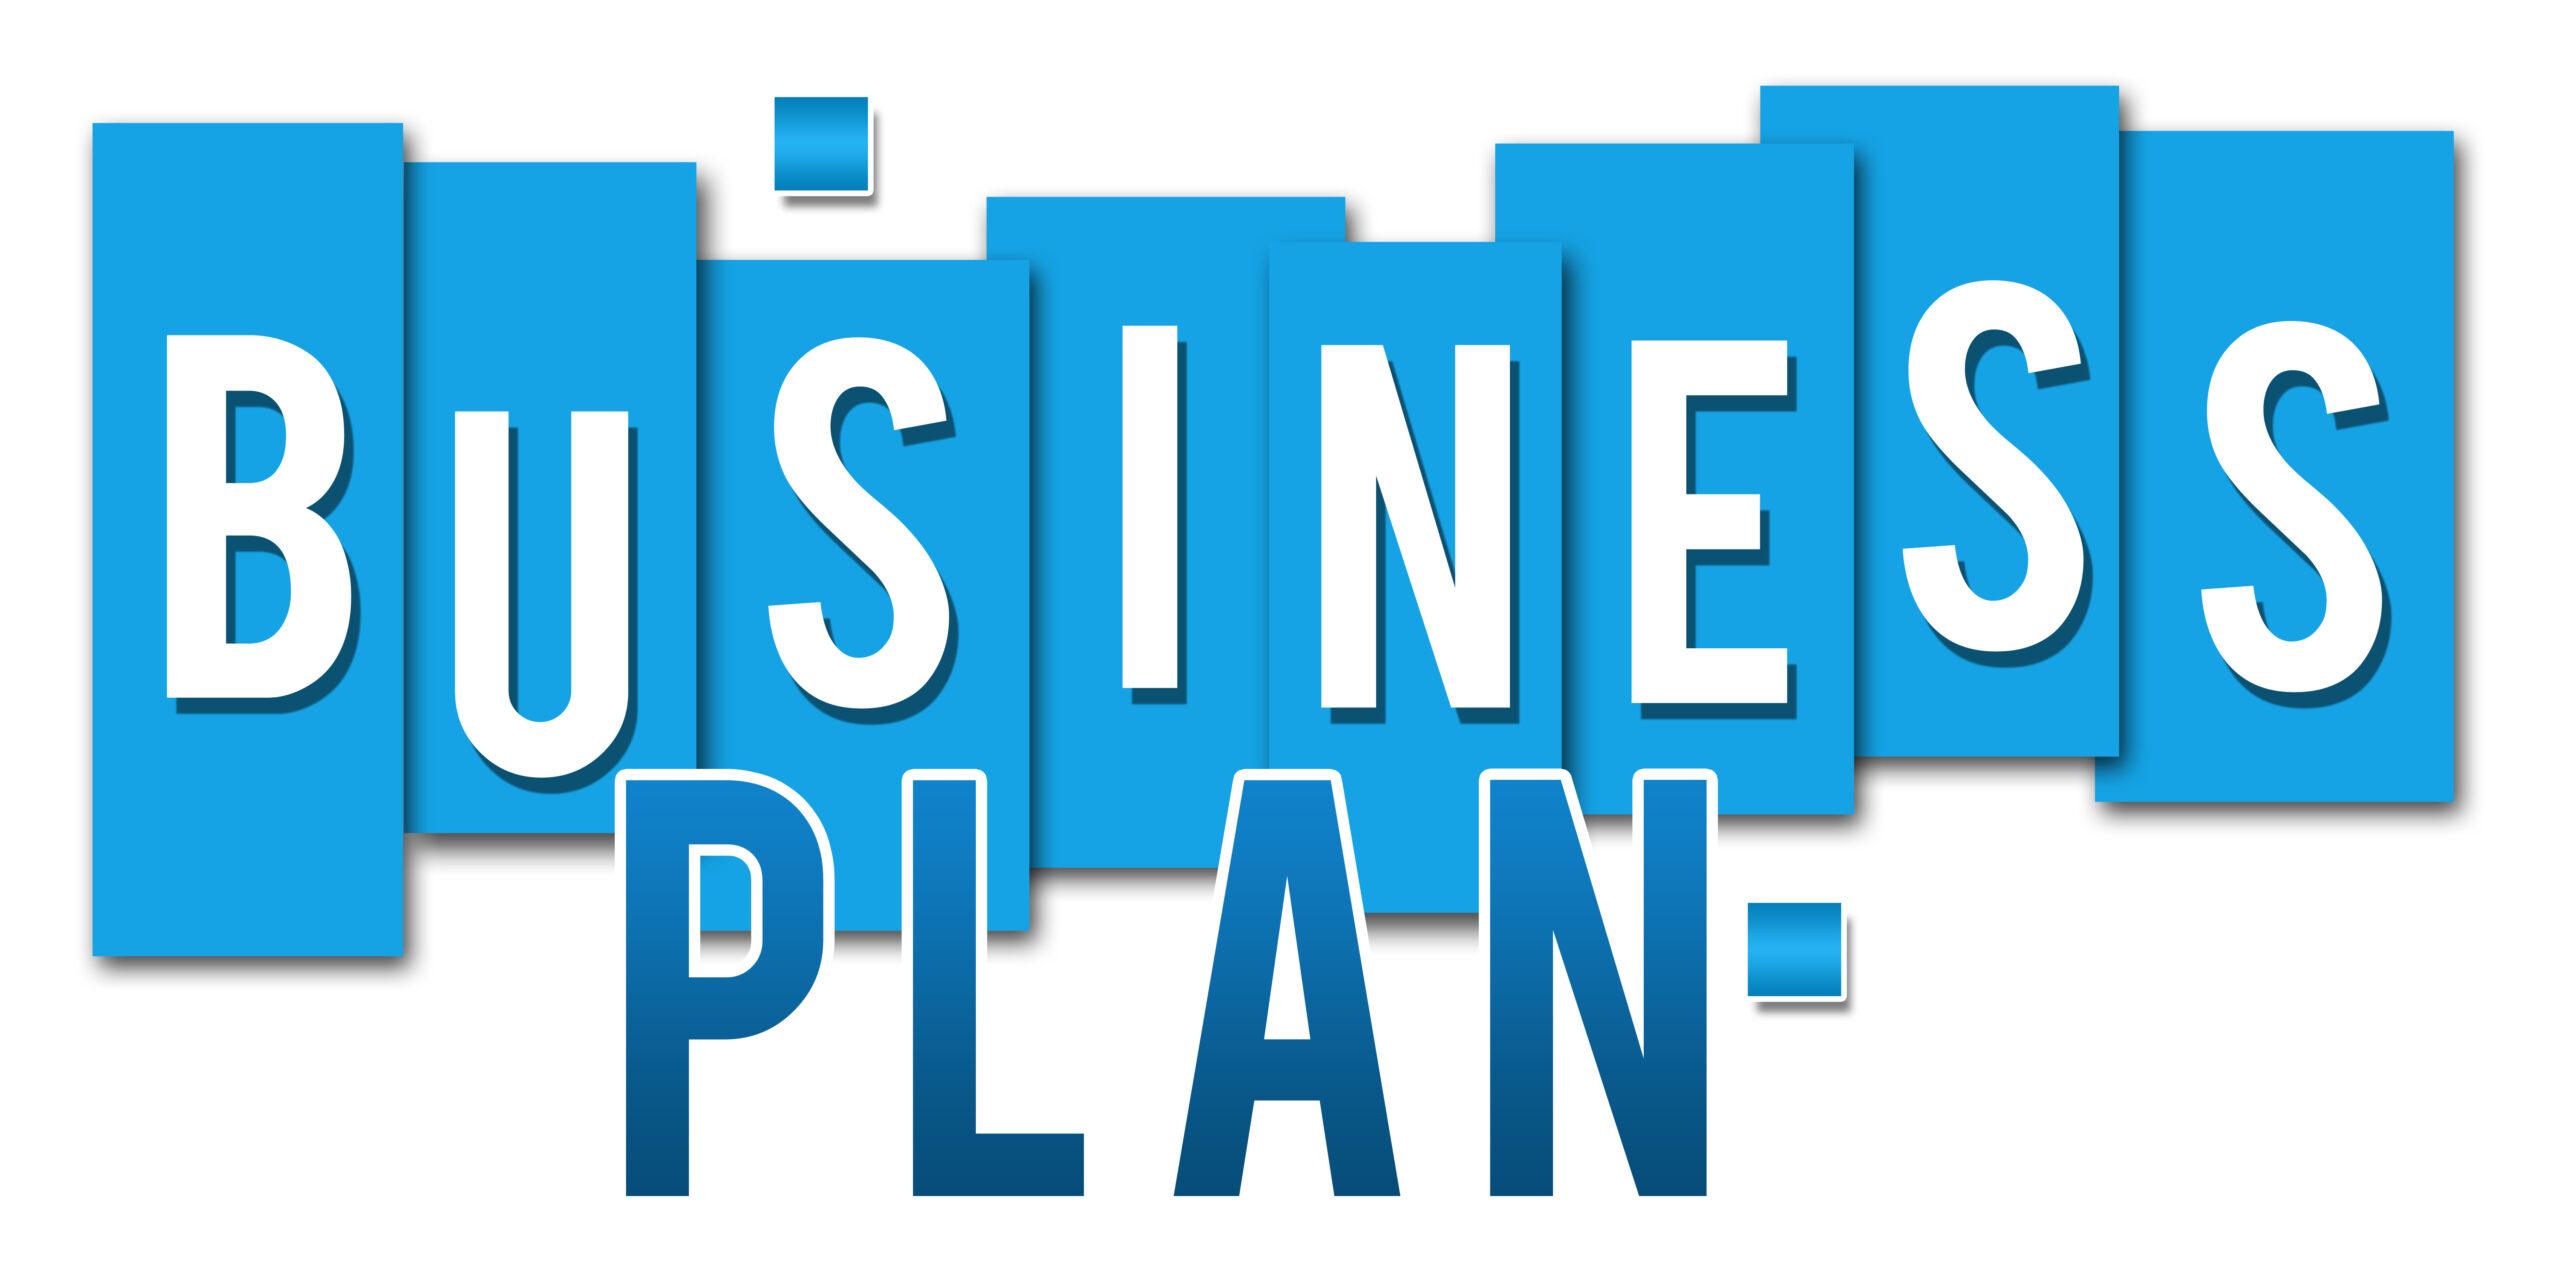 Business plan wording on blue stripes